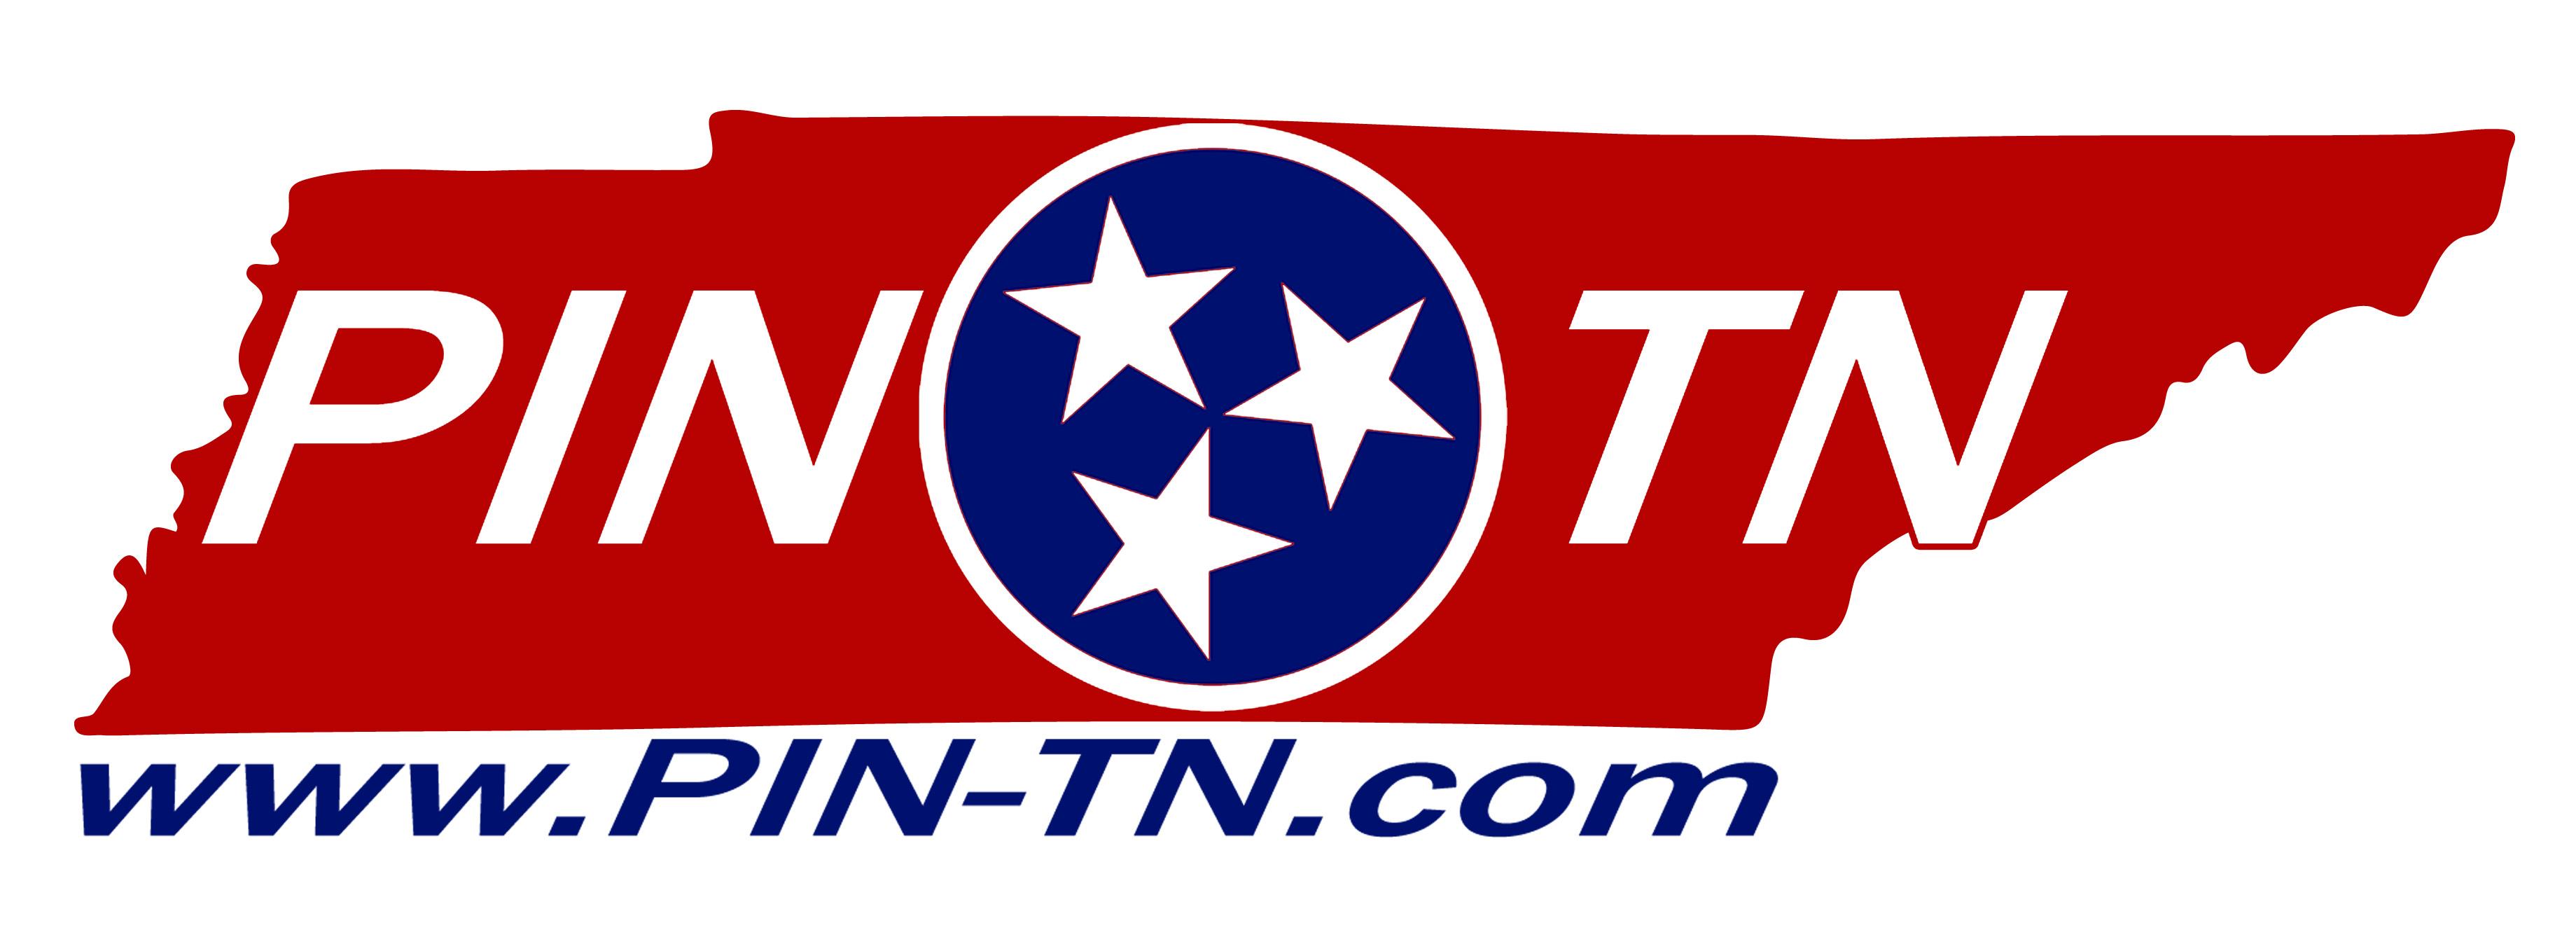 Pin-TN.com